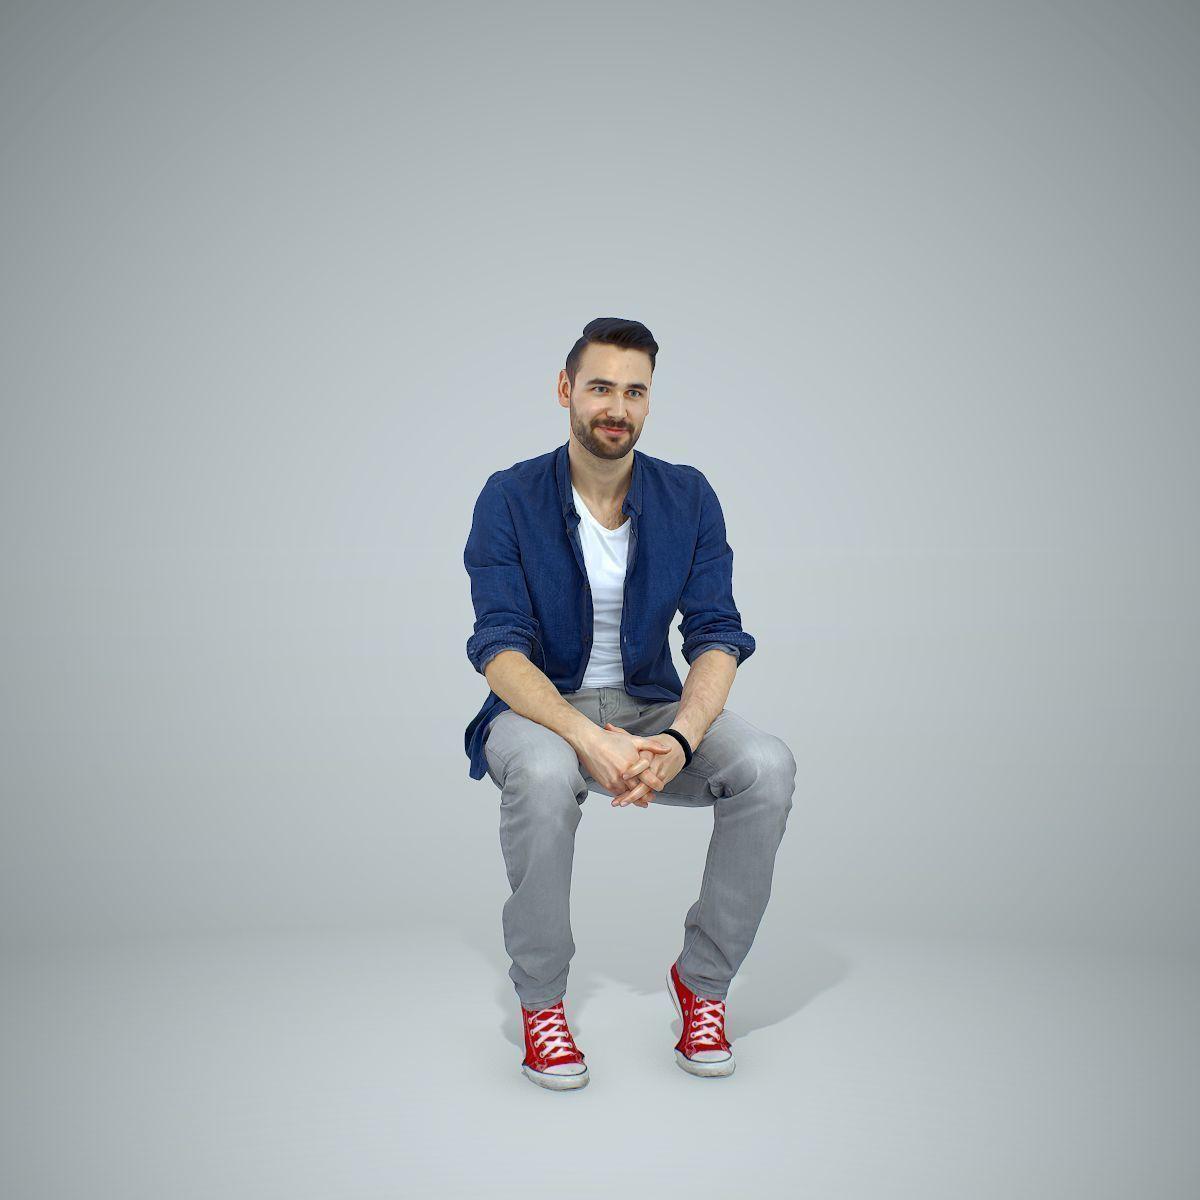 Sitting Man with Blue Shirt and Grey Pants CMan0302-HD2-O01P02-S